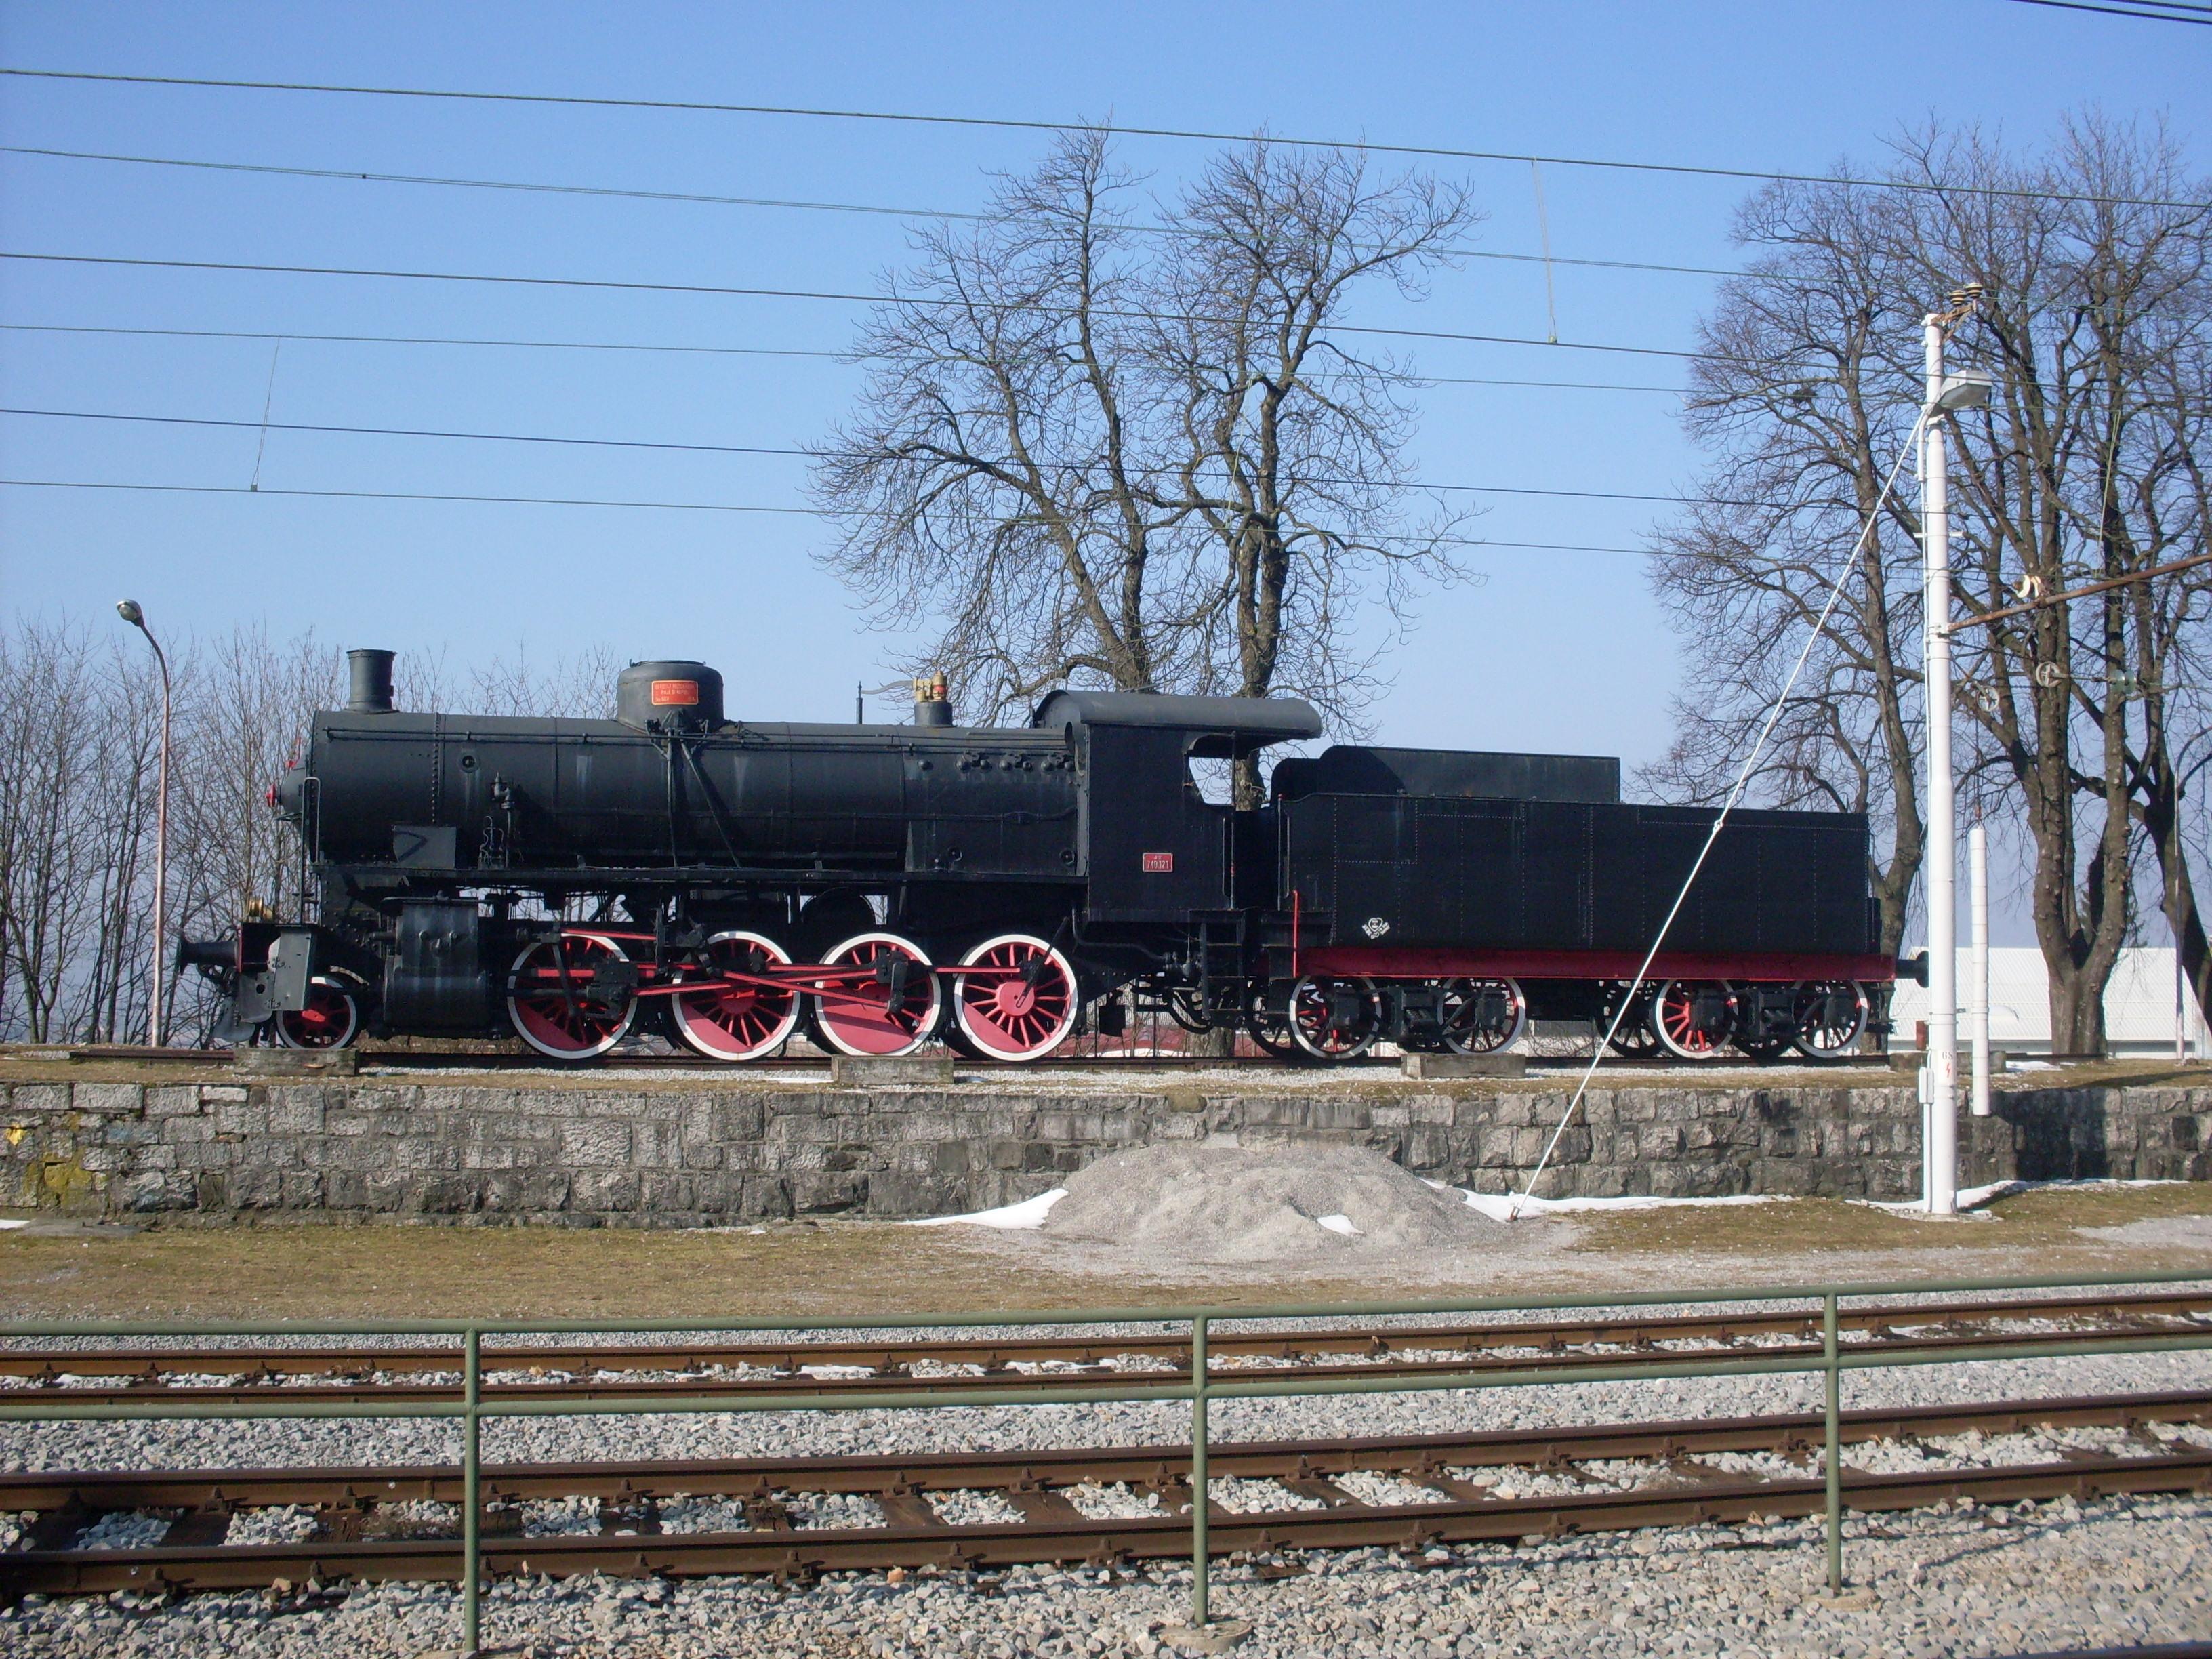 File:Postojna-steam locomotive FS 740.121-left side.jpg ...